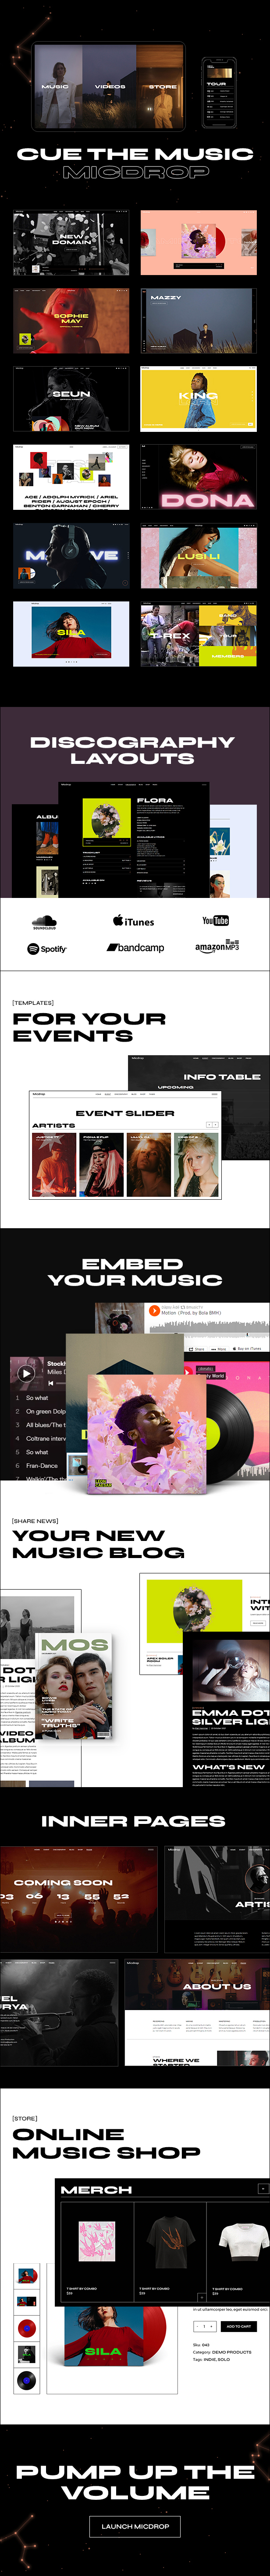 Micdrop - Music WordPress Theme - 2